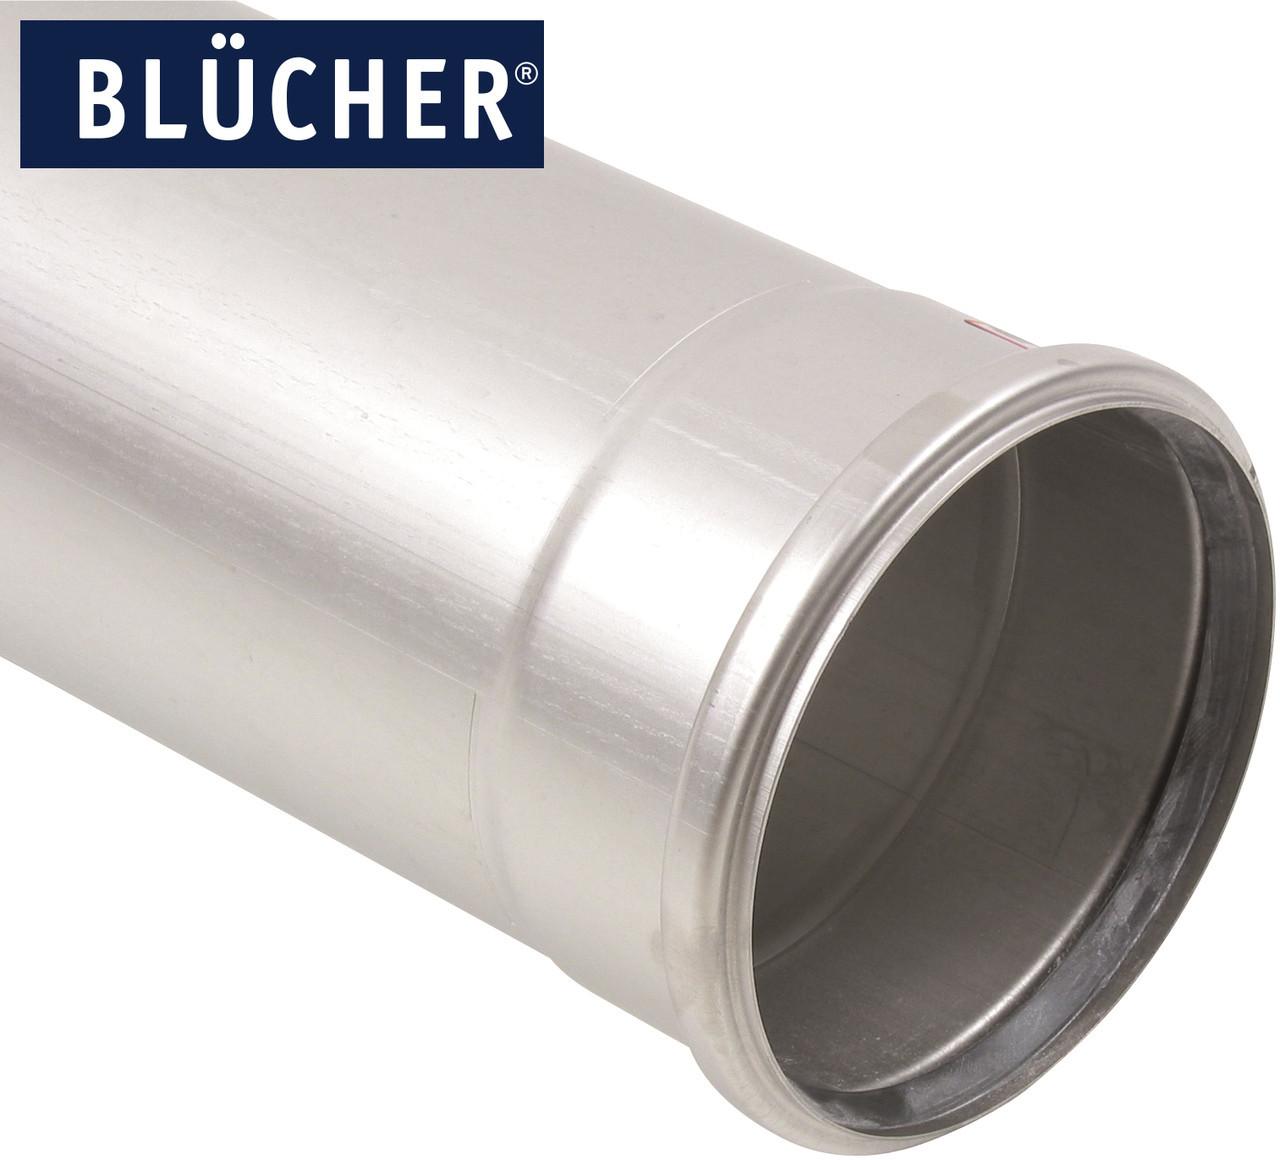 Каналізаційна труба BLUCHER з нержавіючої сталі AISI304 / AISI316L, 3000мм, DN160